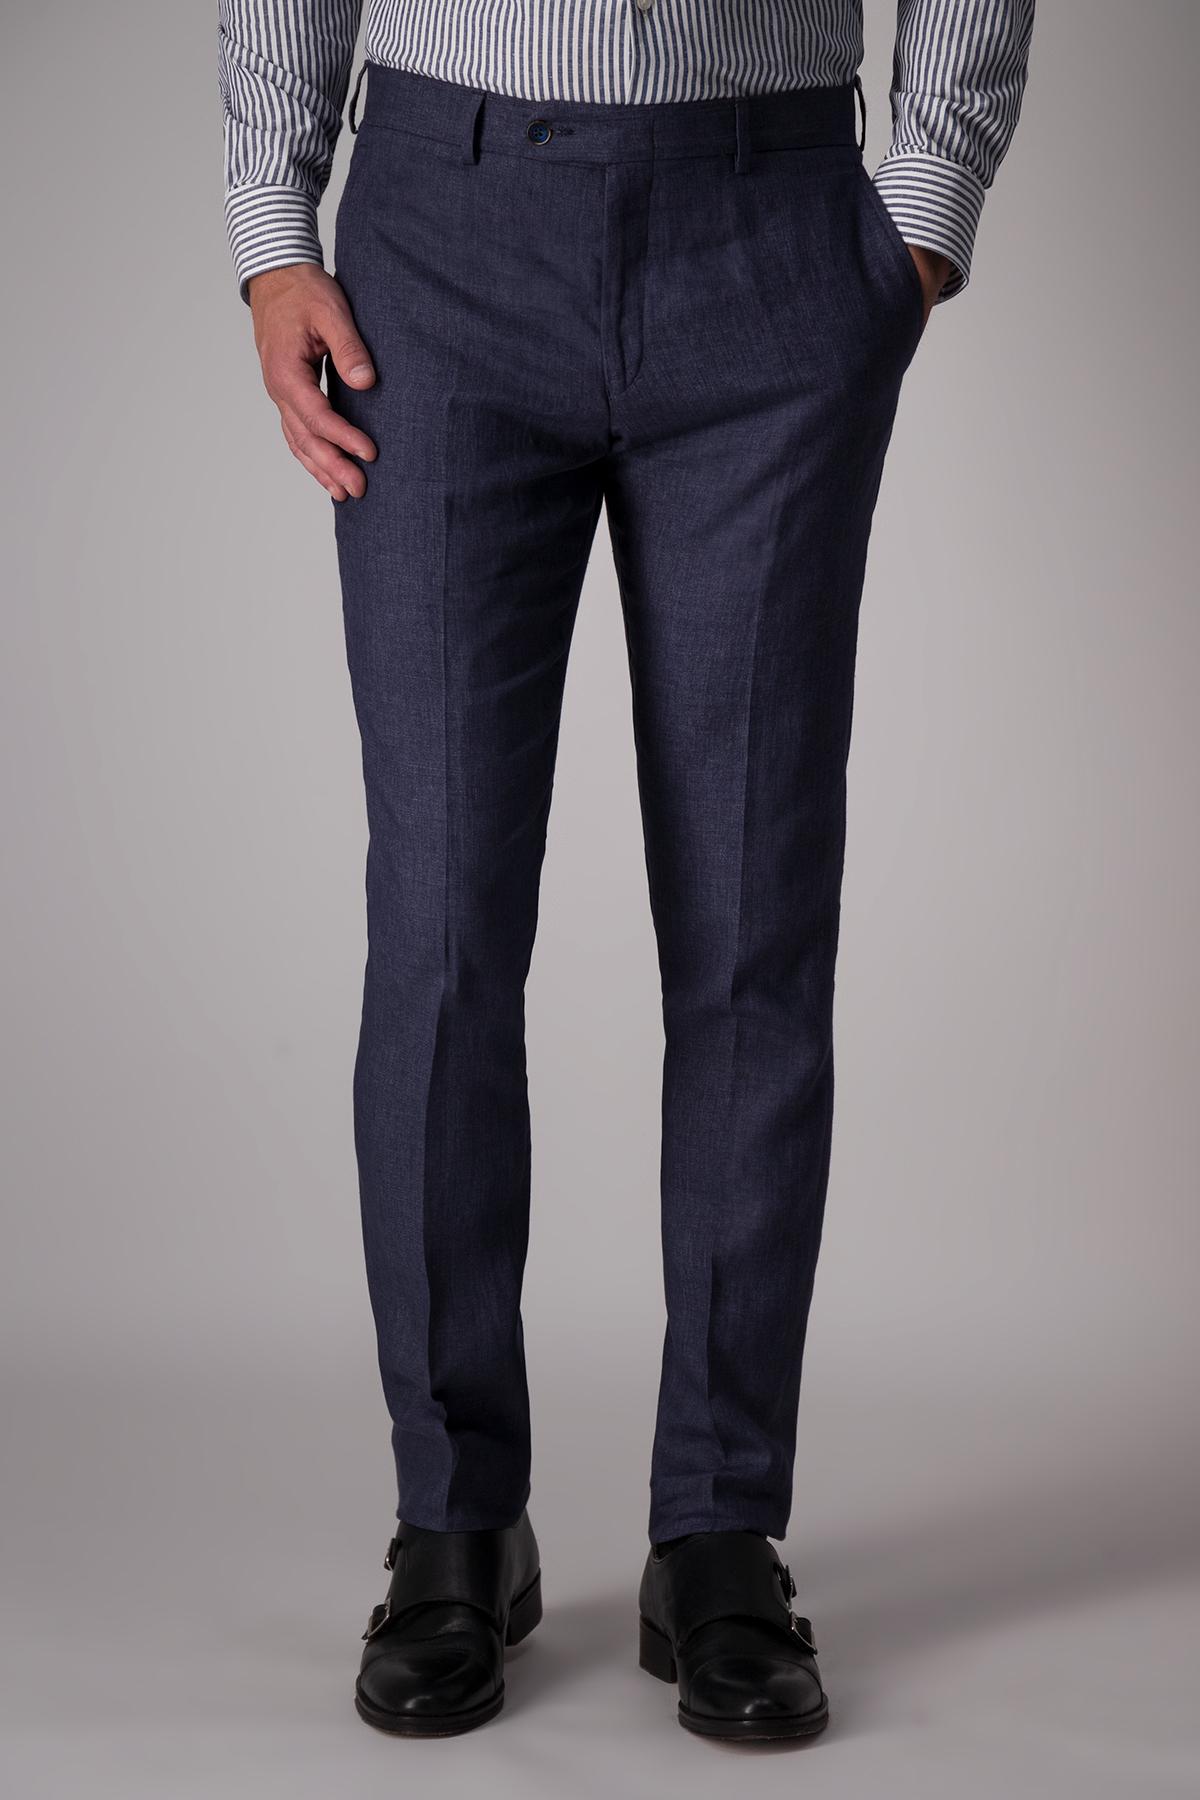 Pantalón Turin lino azul